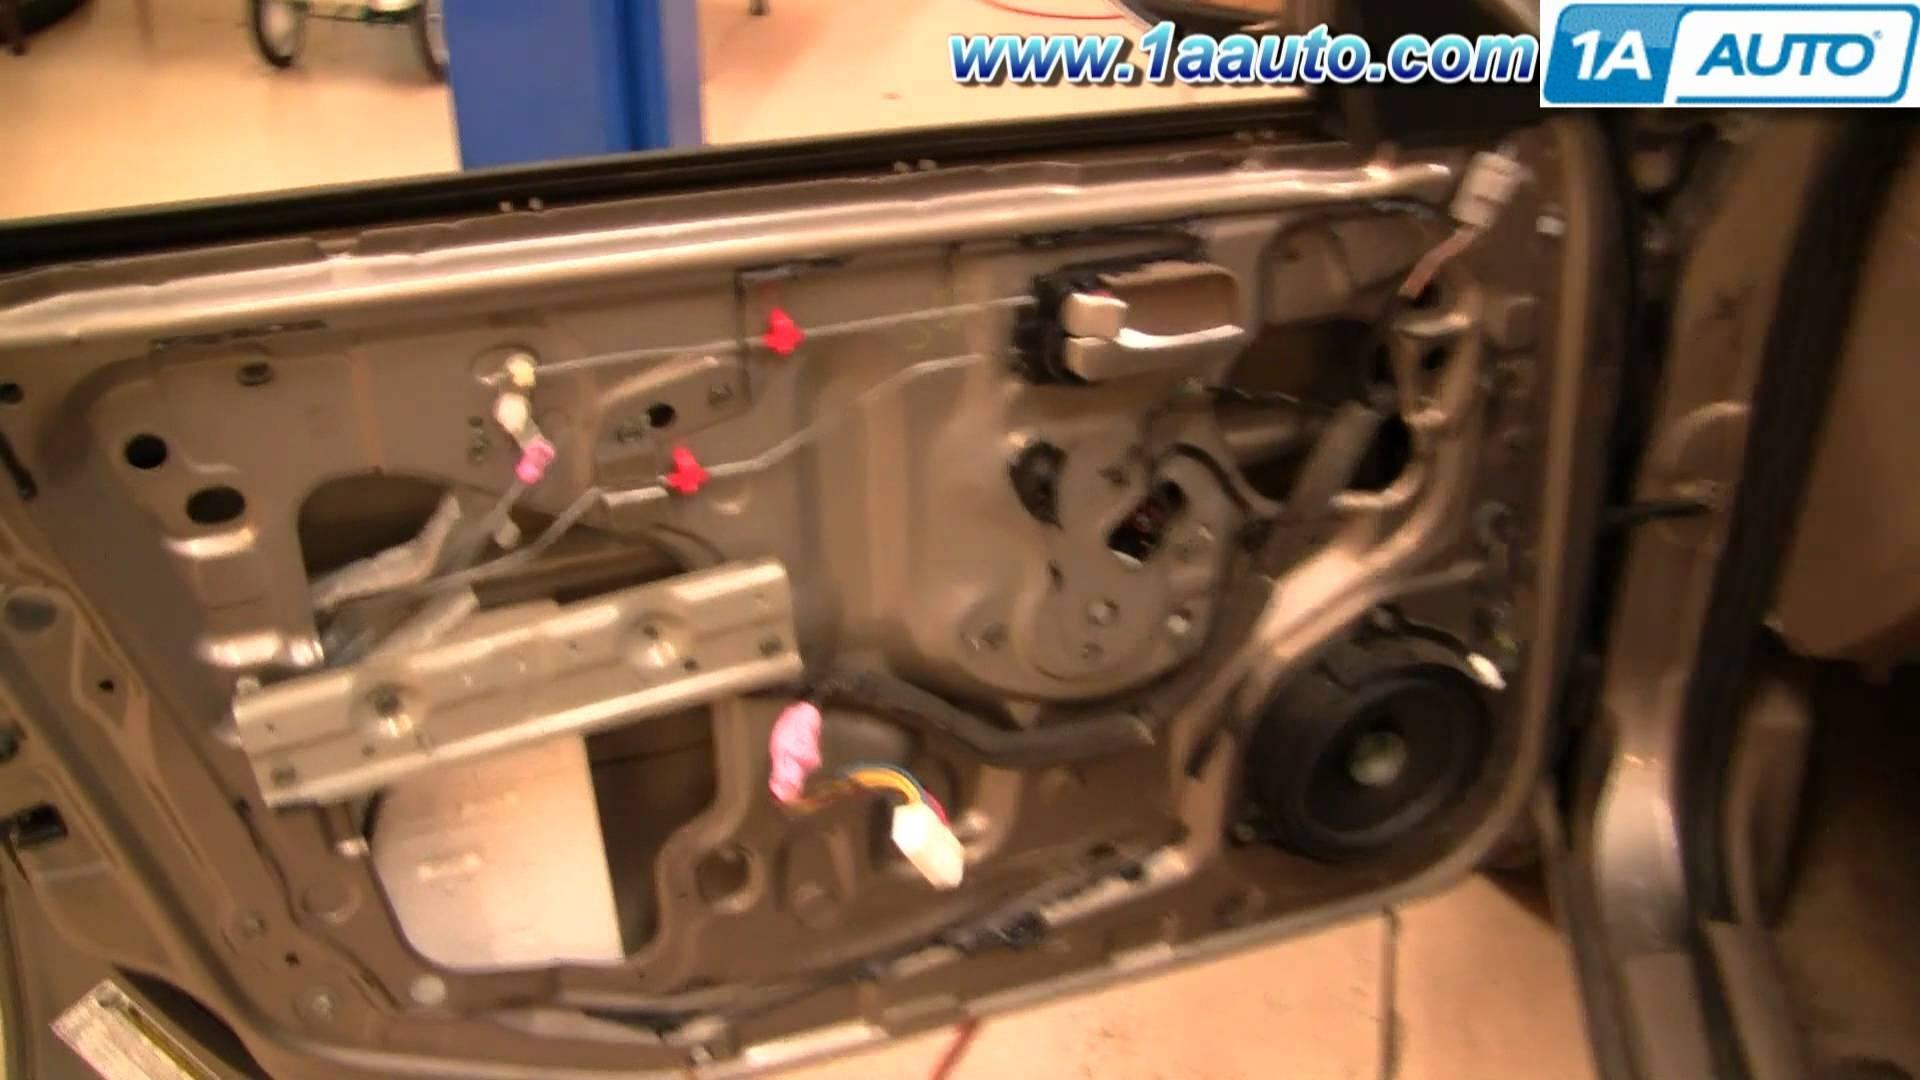 1994 Nissan Sentra Engine Diagram 1997 2007 Kia Altima Fuse Box How To Install Replace Power Window Motor Or Regulator